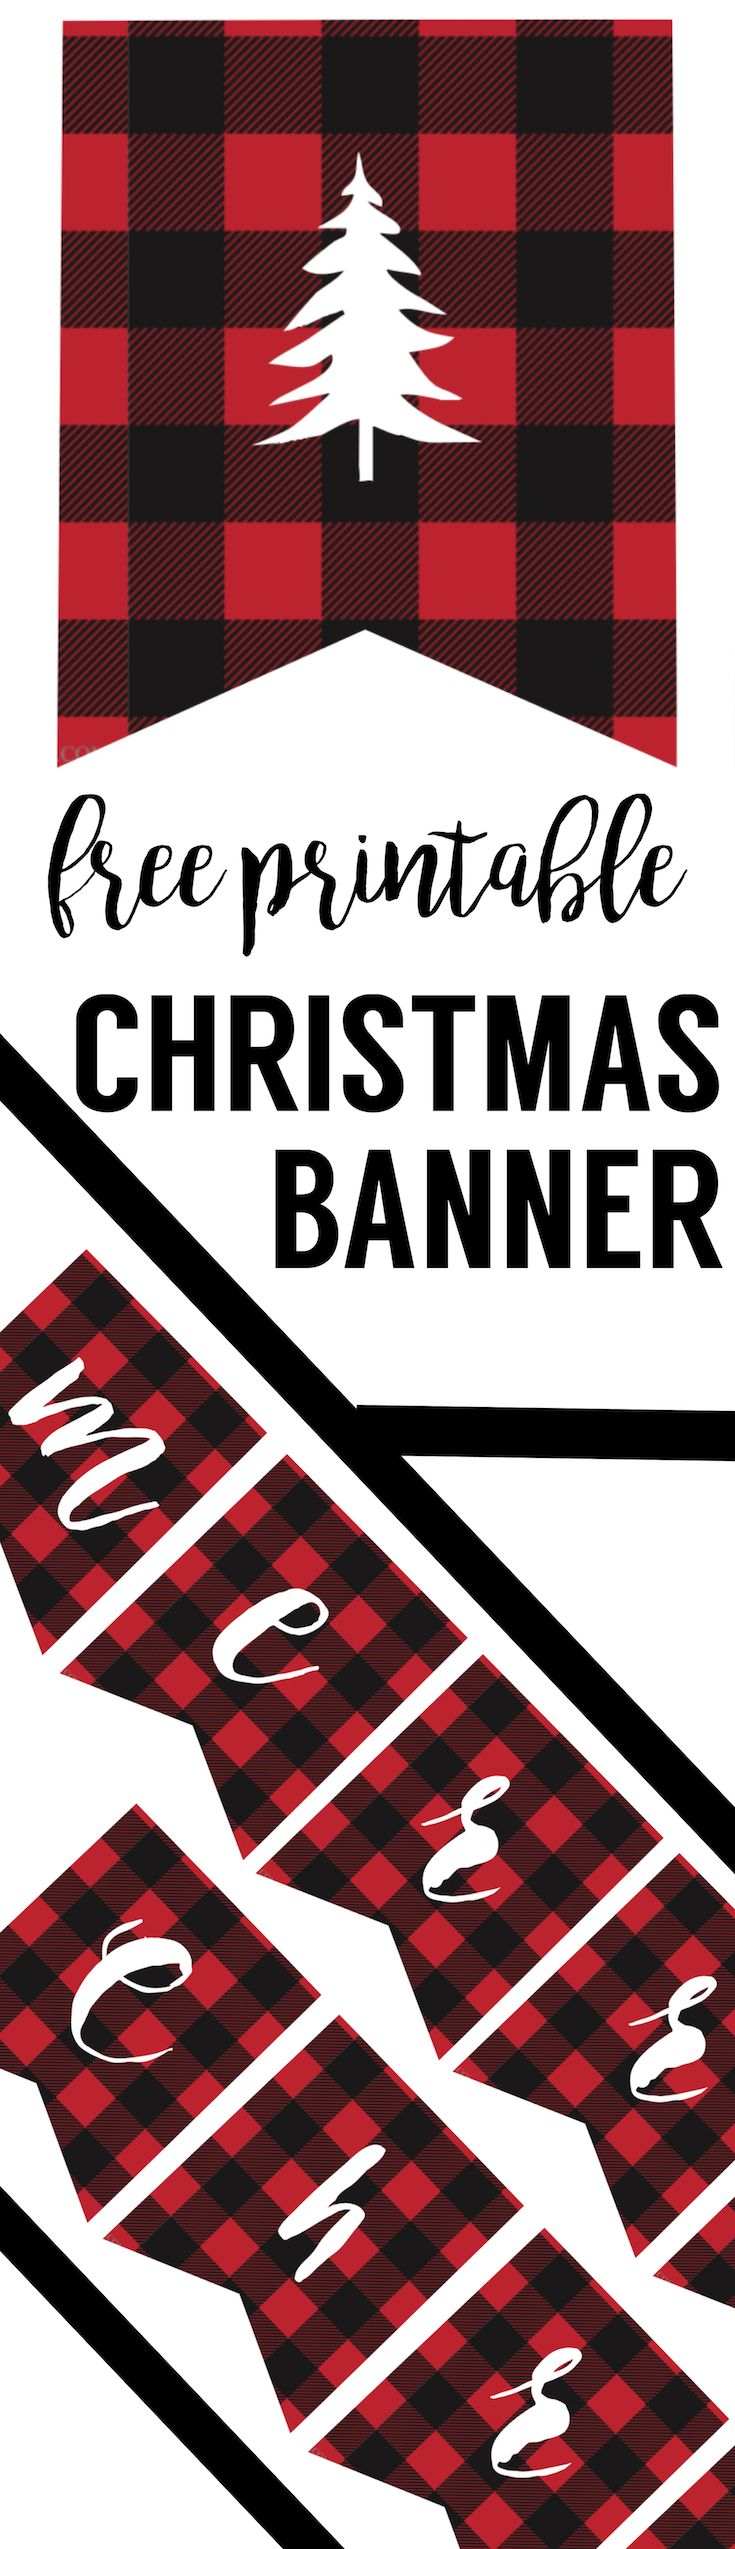 Free Printable Merry Christmas Banner | Navidad y Cosas